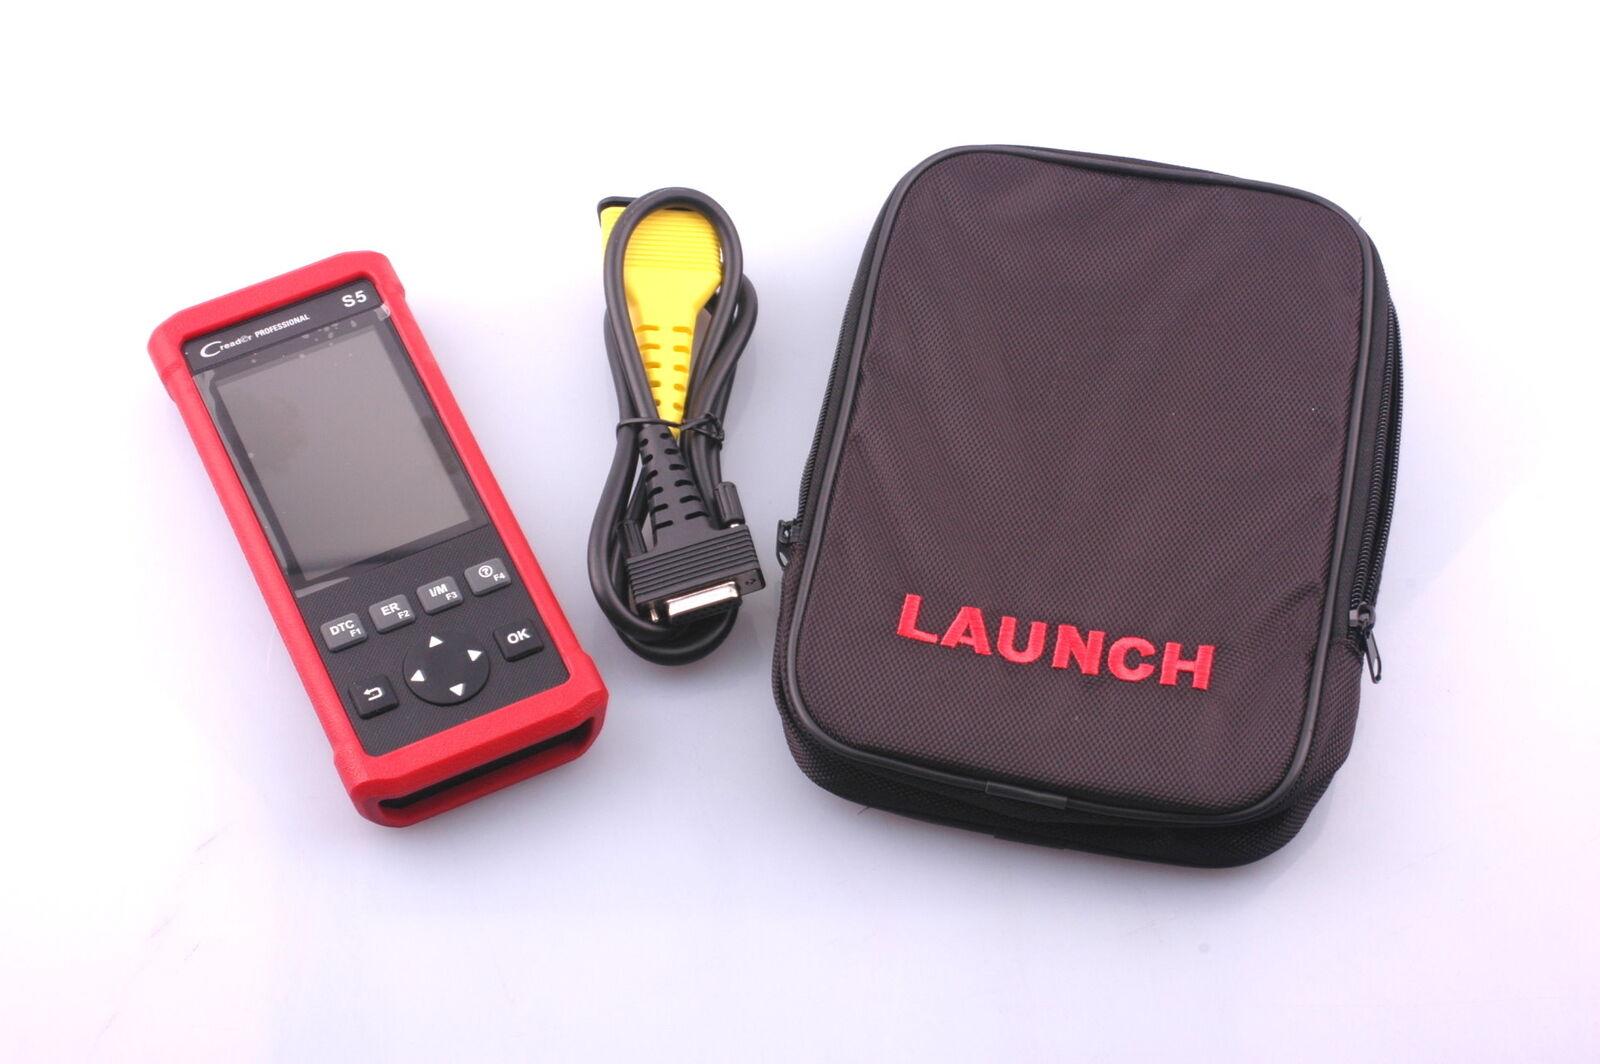 LAUNCH S5 Diagnosegerät passt passt passt für Suzuki Lapin  inkl. Service Funktionen cbab11